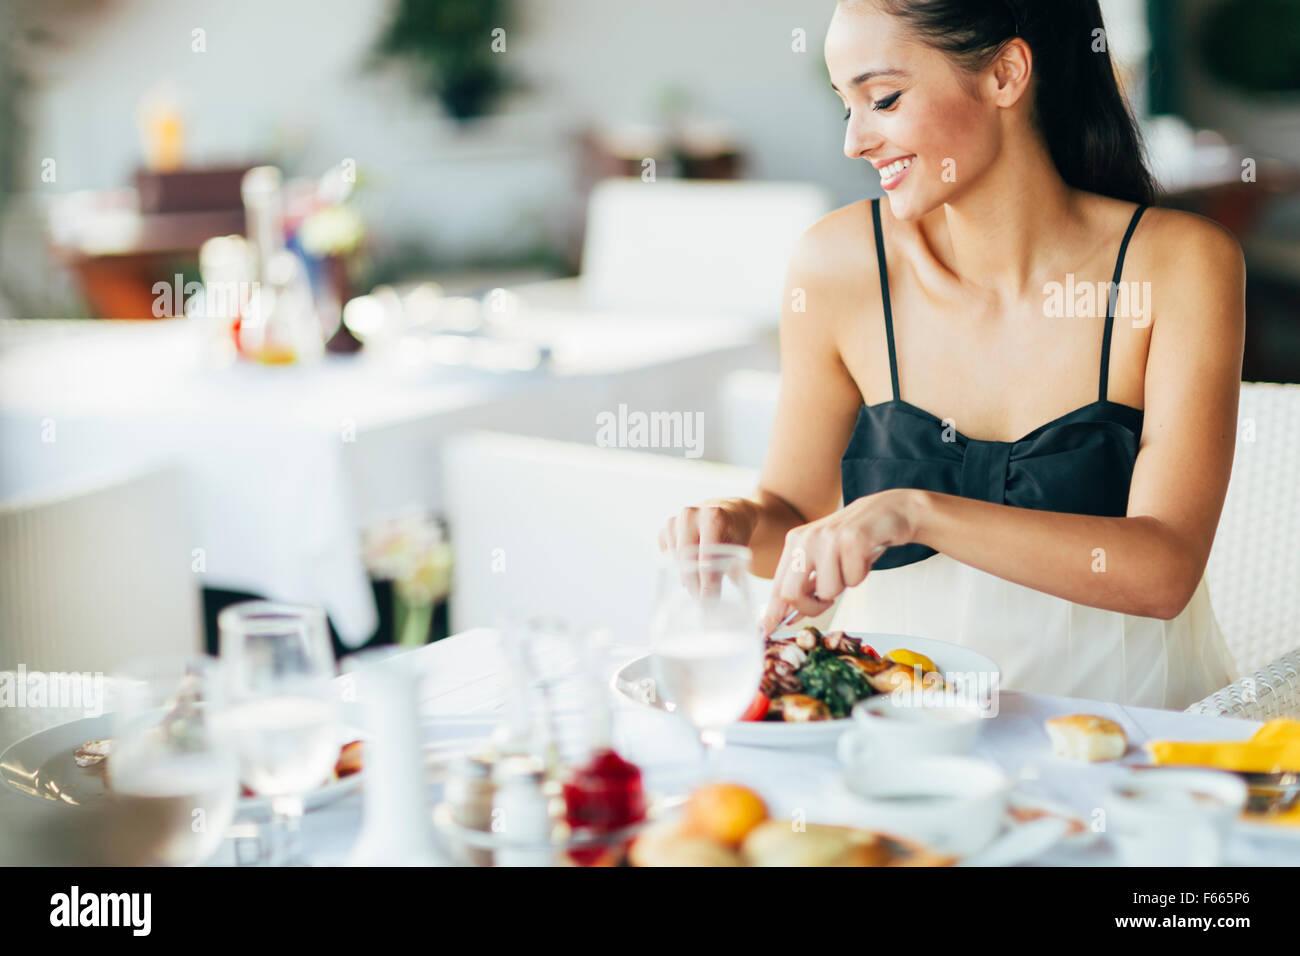 Attractive Woman eating in outdoor restaurant Photo Stock